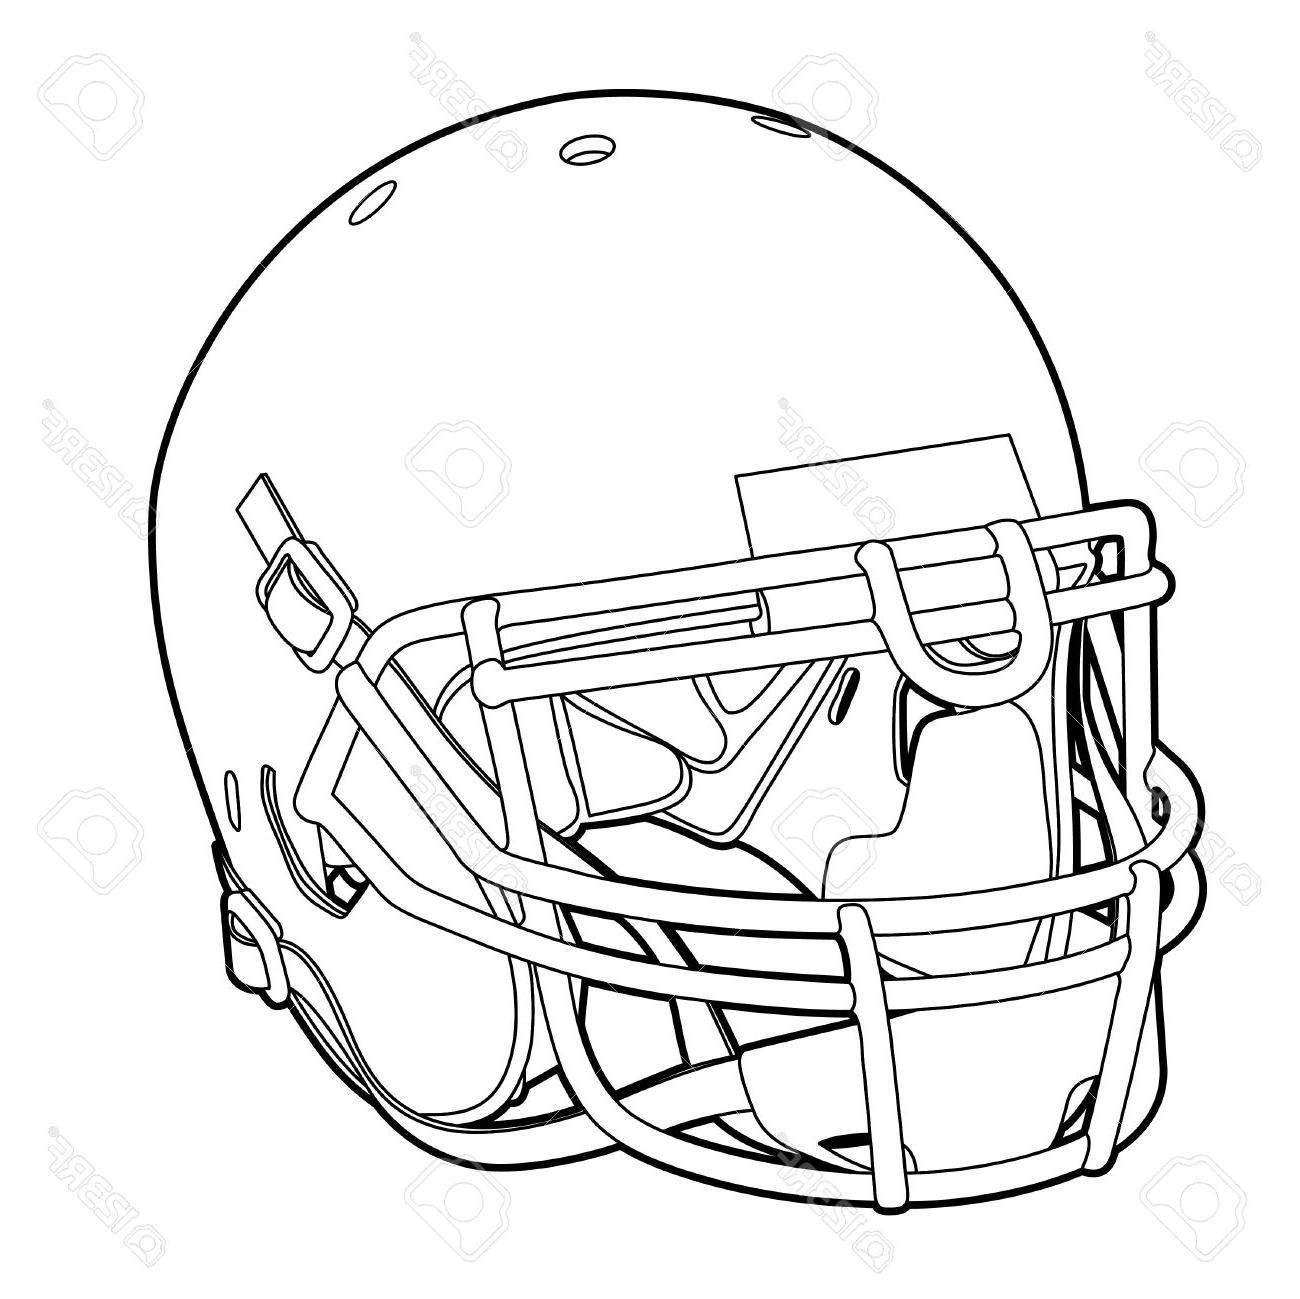 1300x1299 Best Hd American Football Helmet Outline Vector Illustration Stock